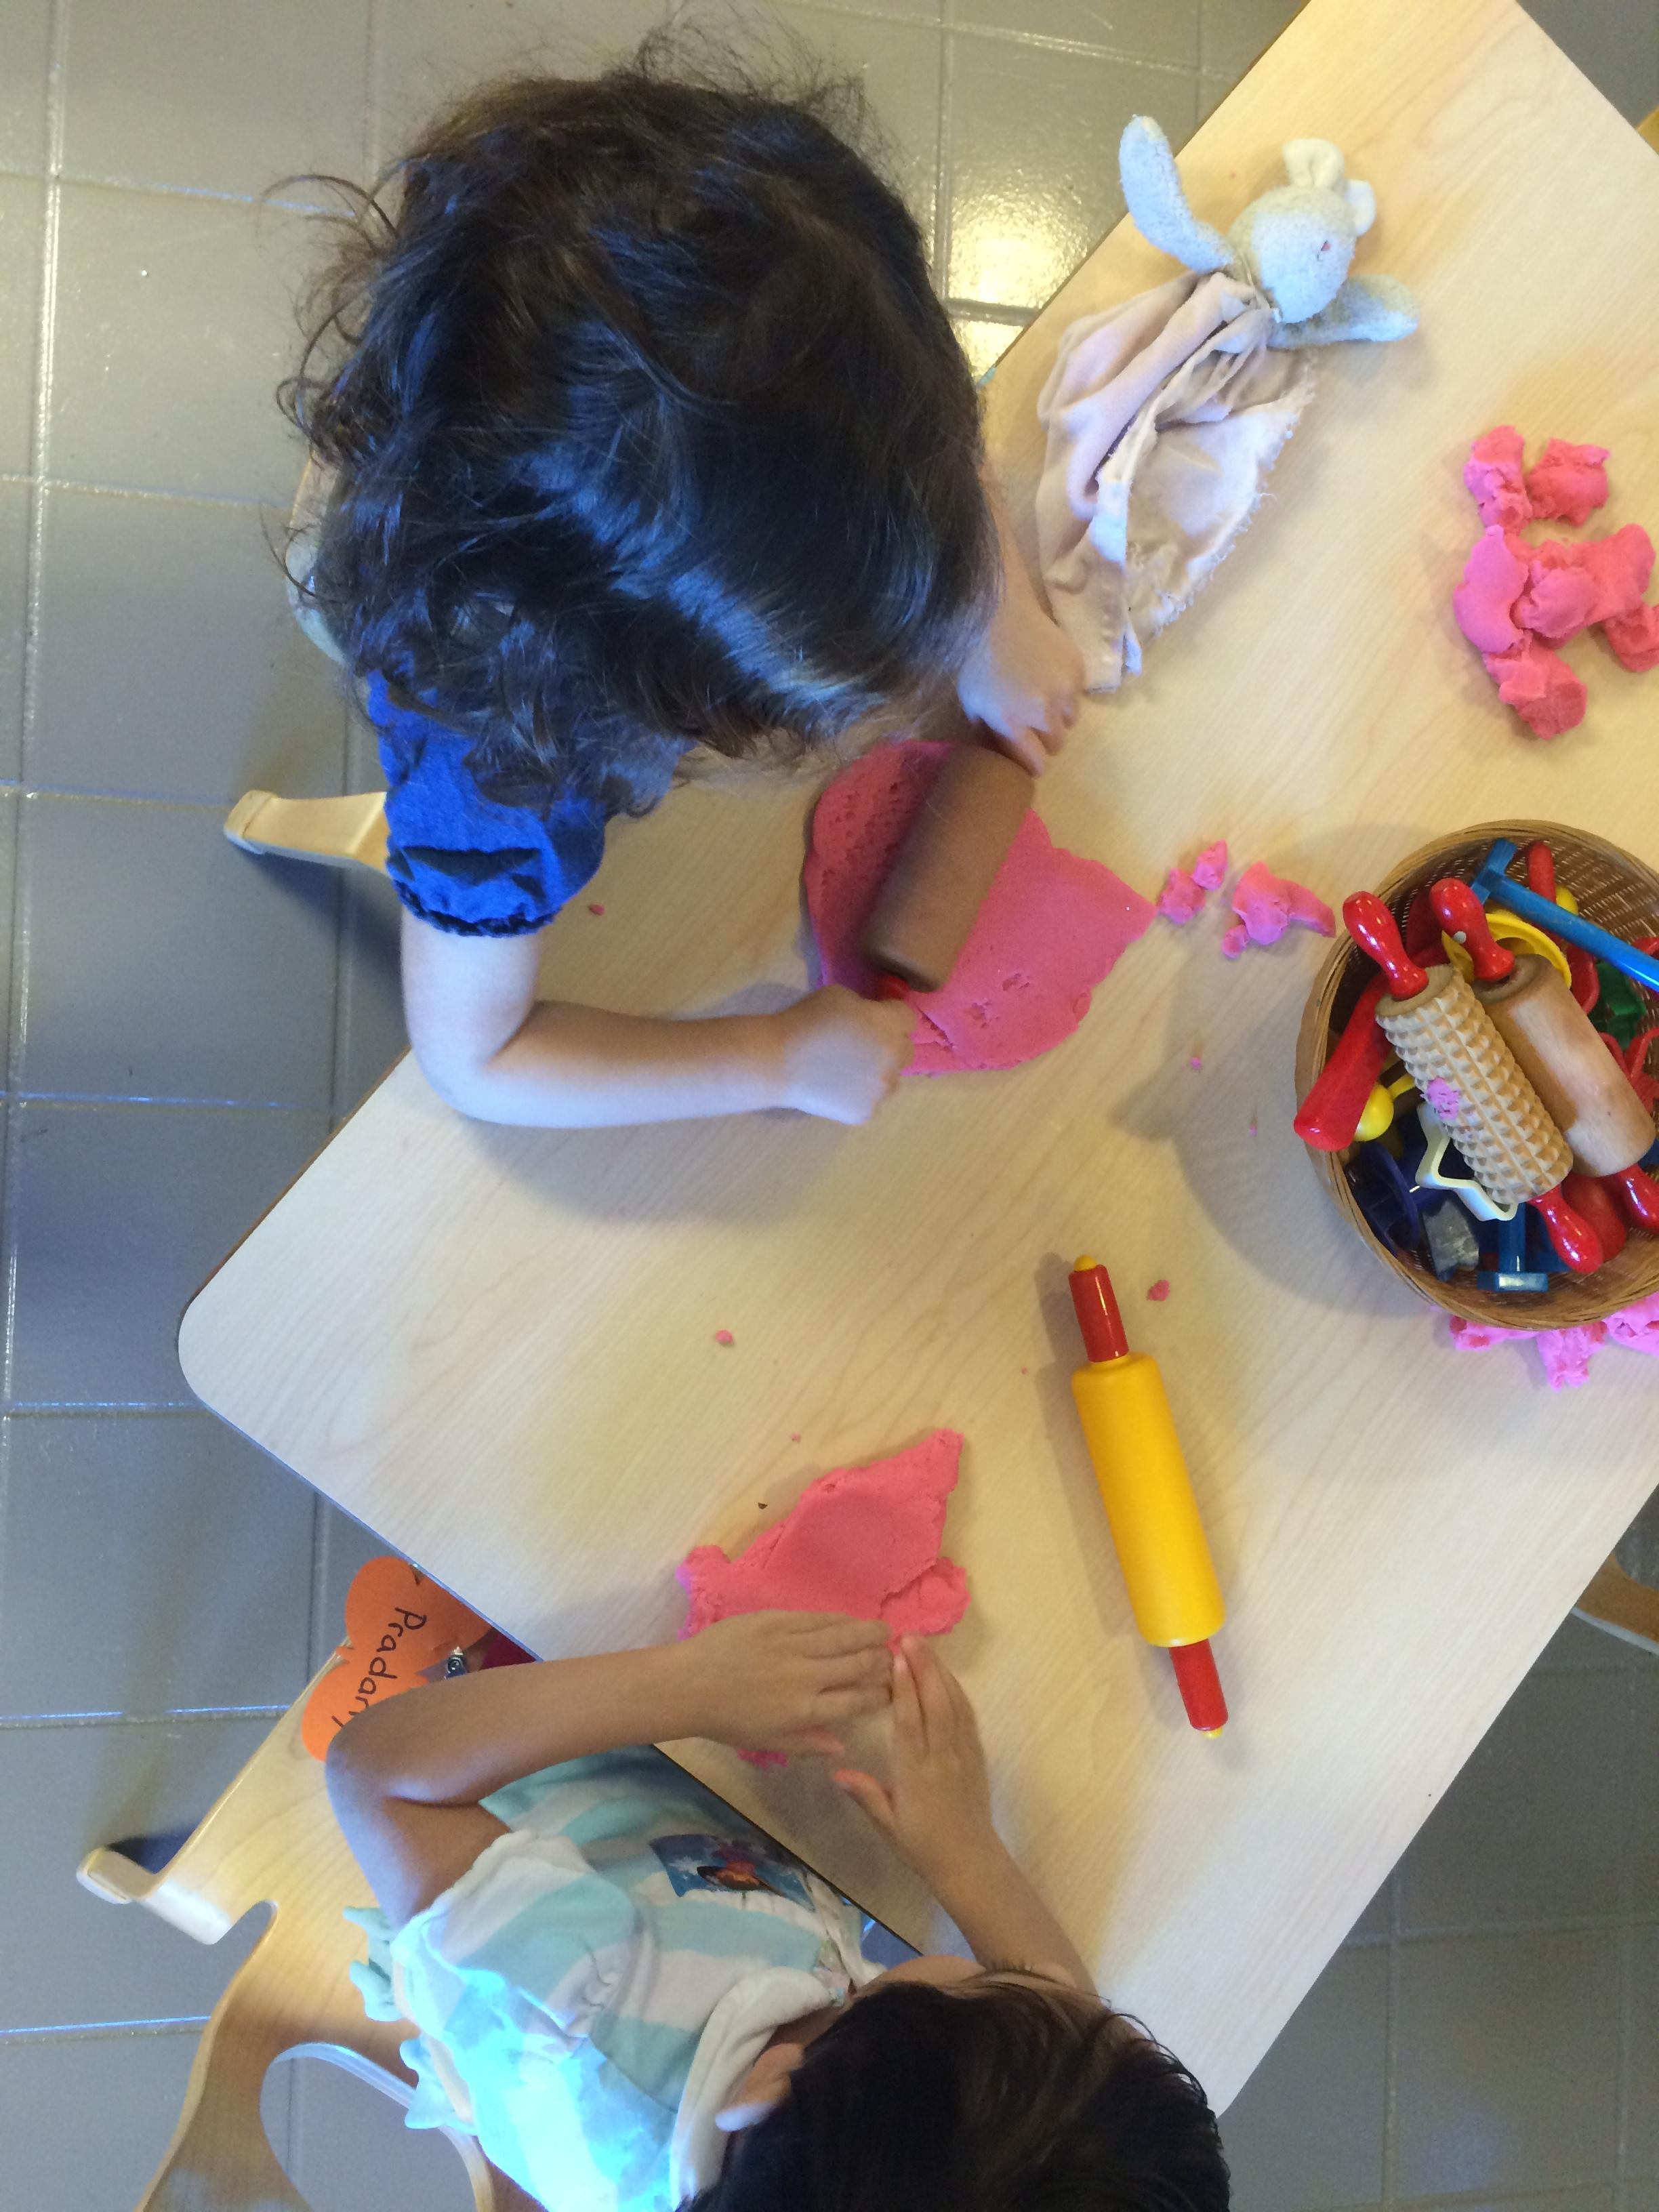 Play dough activities help strengthen little hands and imaginations!